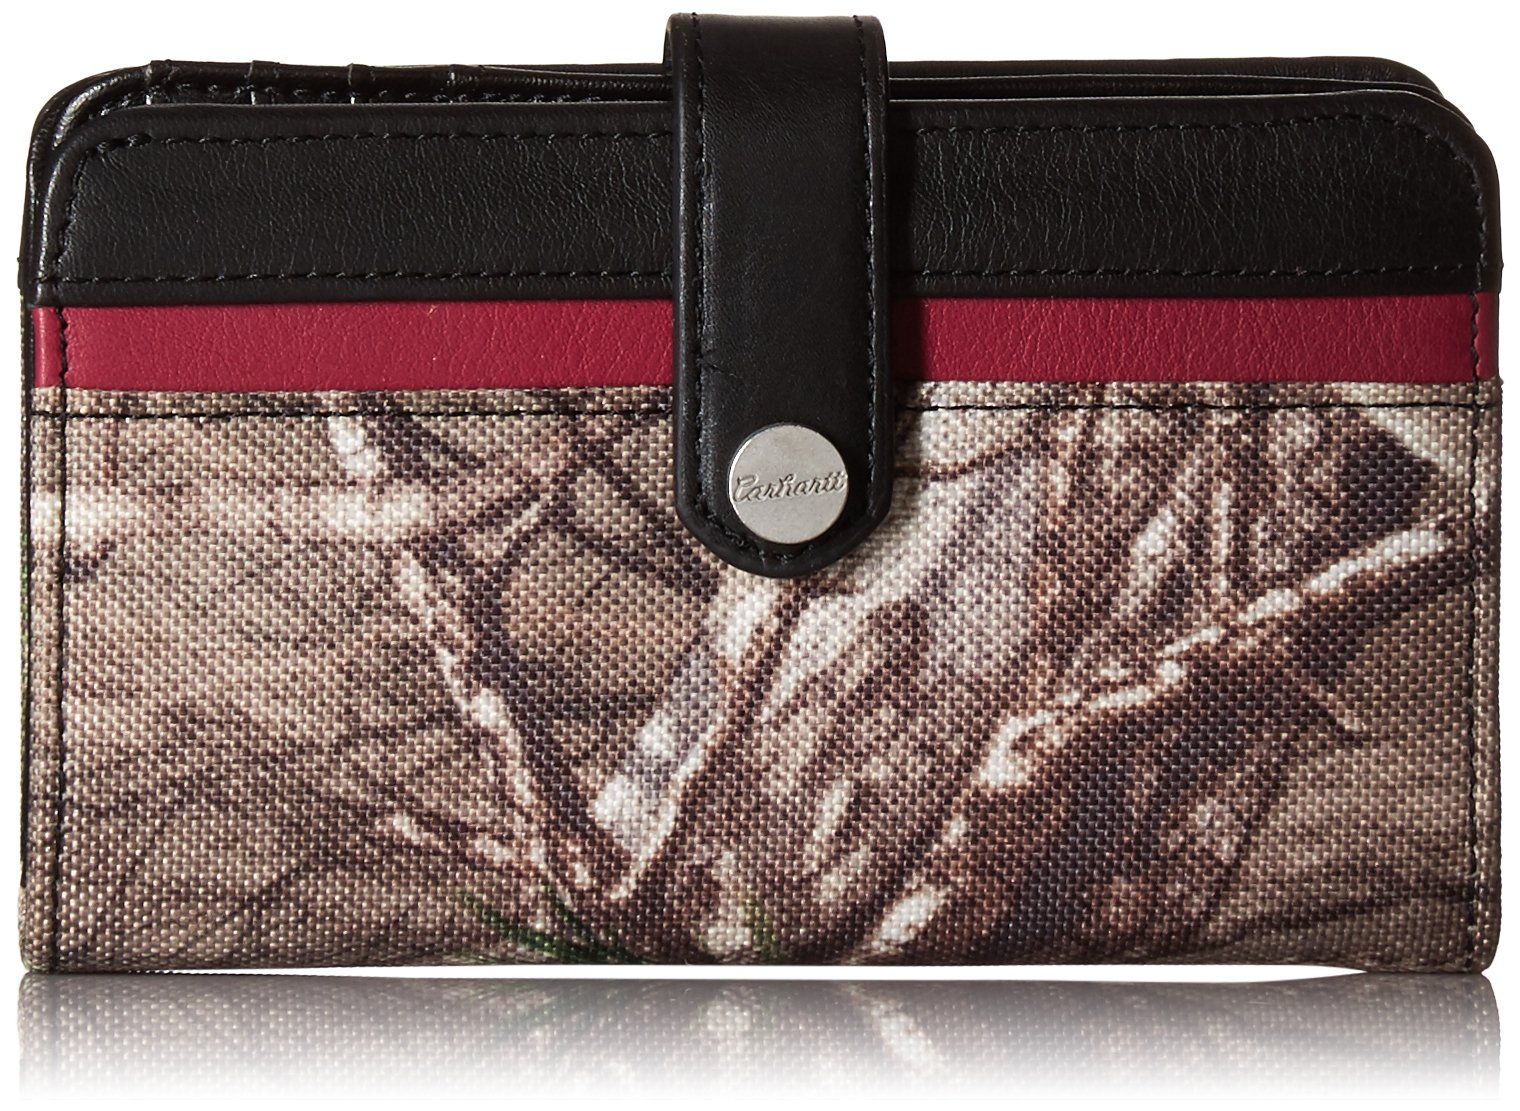 Carhartt Women's Realtree Medium Zip Wallet